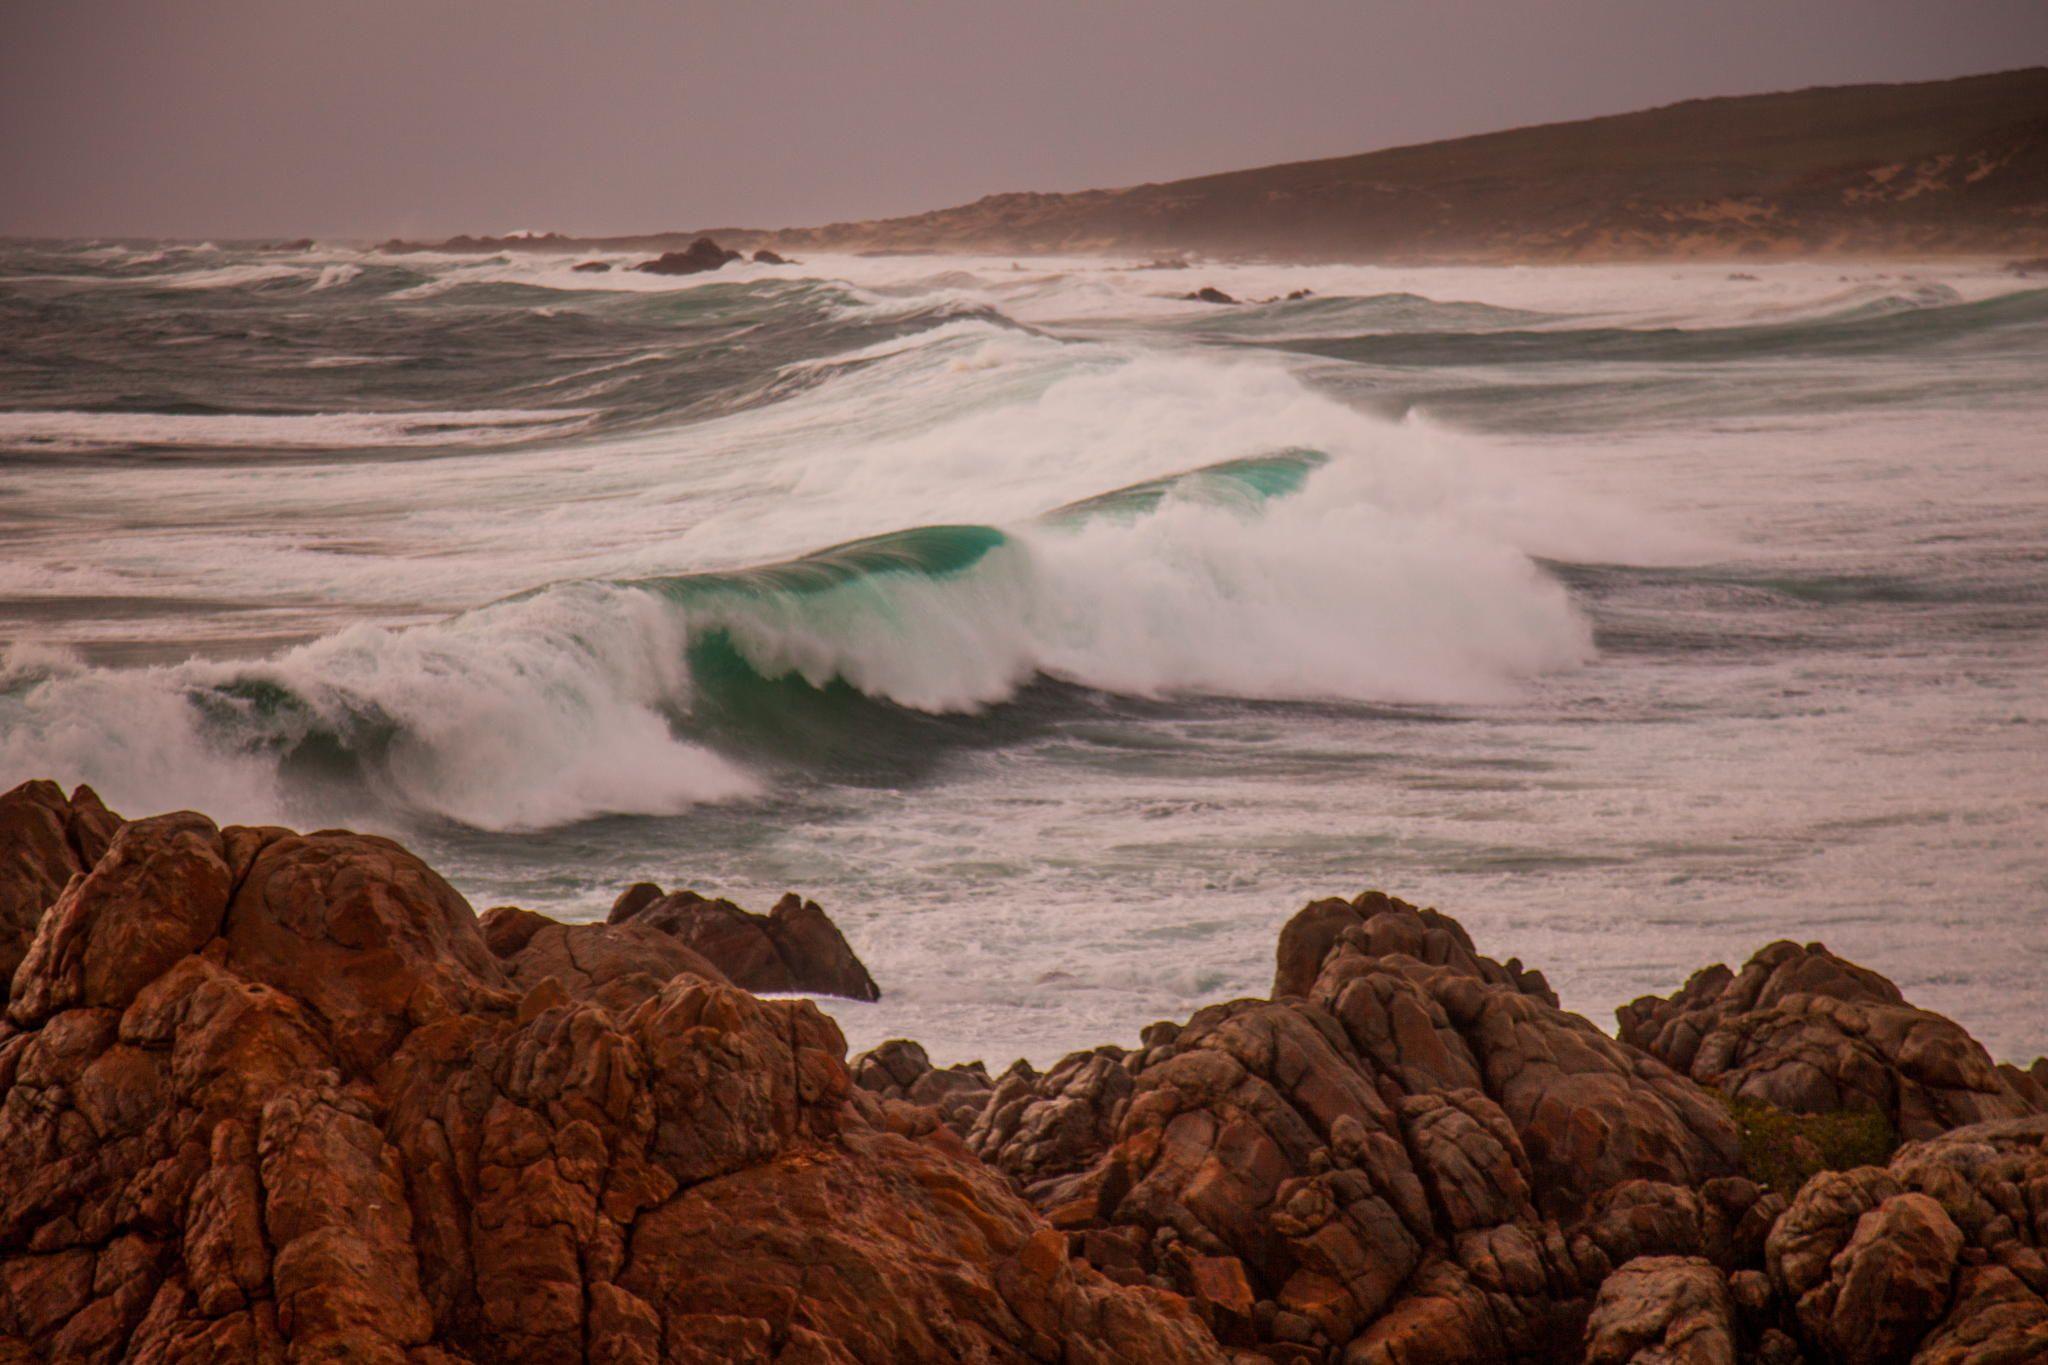 Stormy Seas by Paul Donovan on 500px